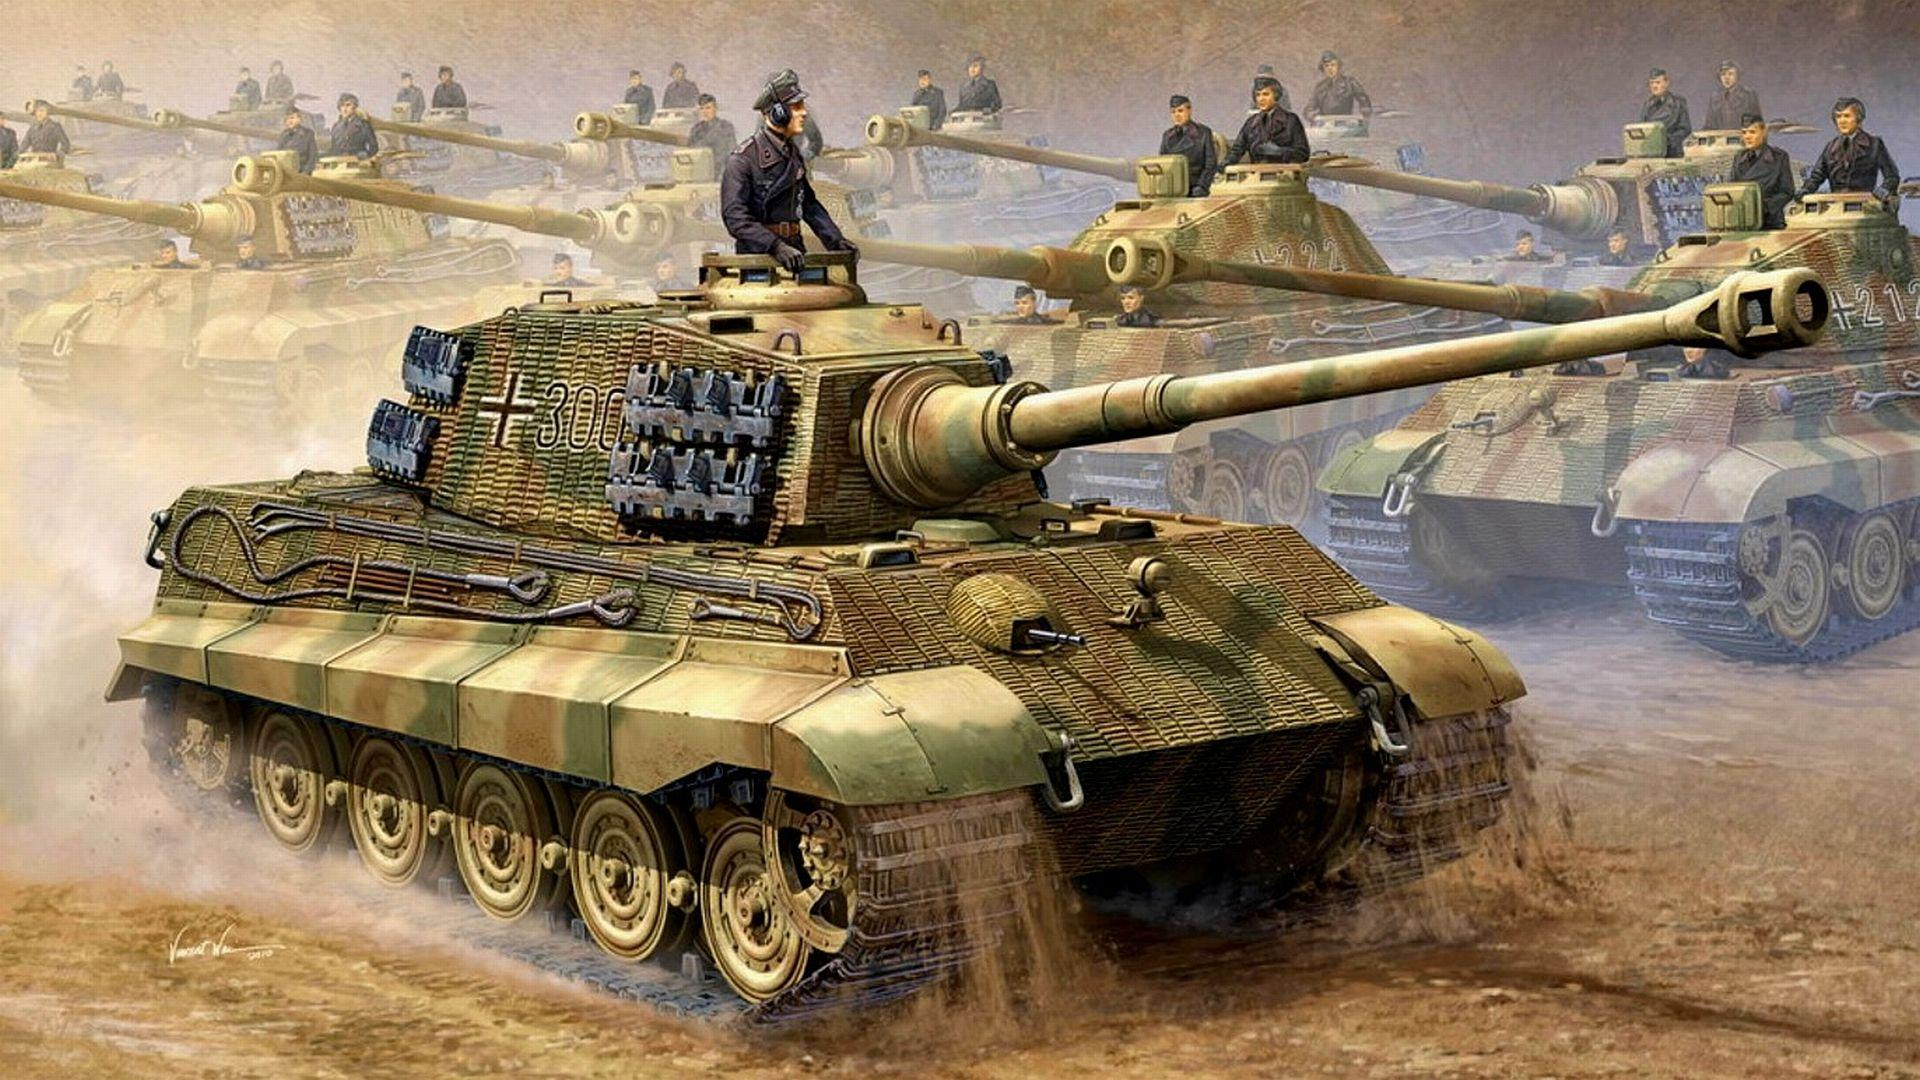 Download Ww2 Tanks Wallpaper Hd Backgrounds Download Itlcat